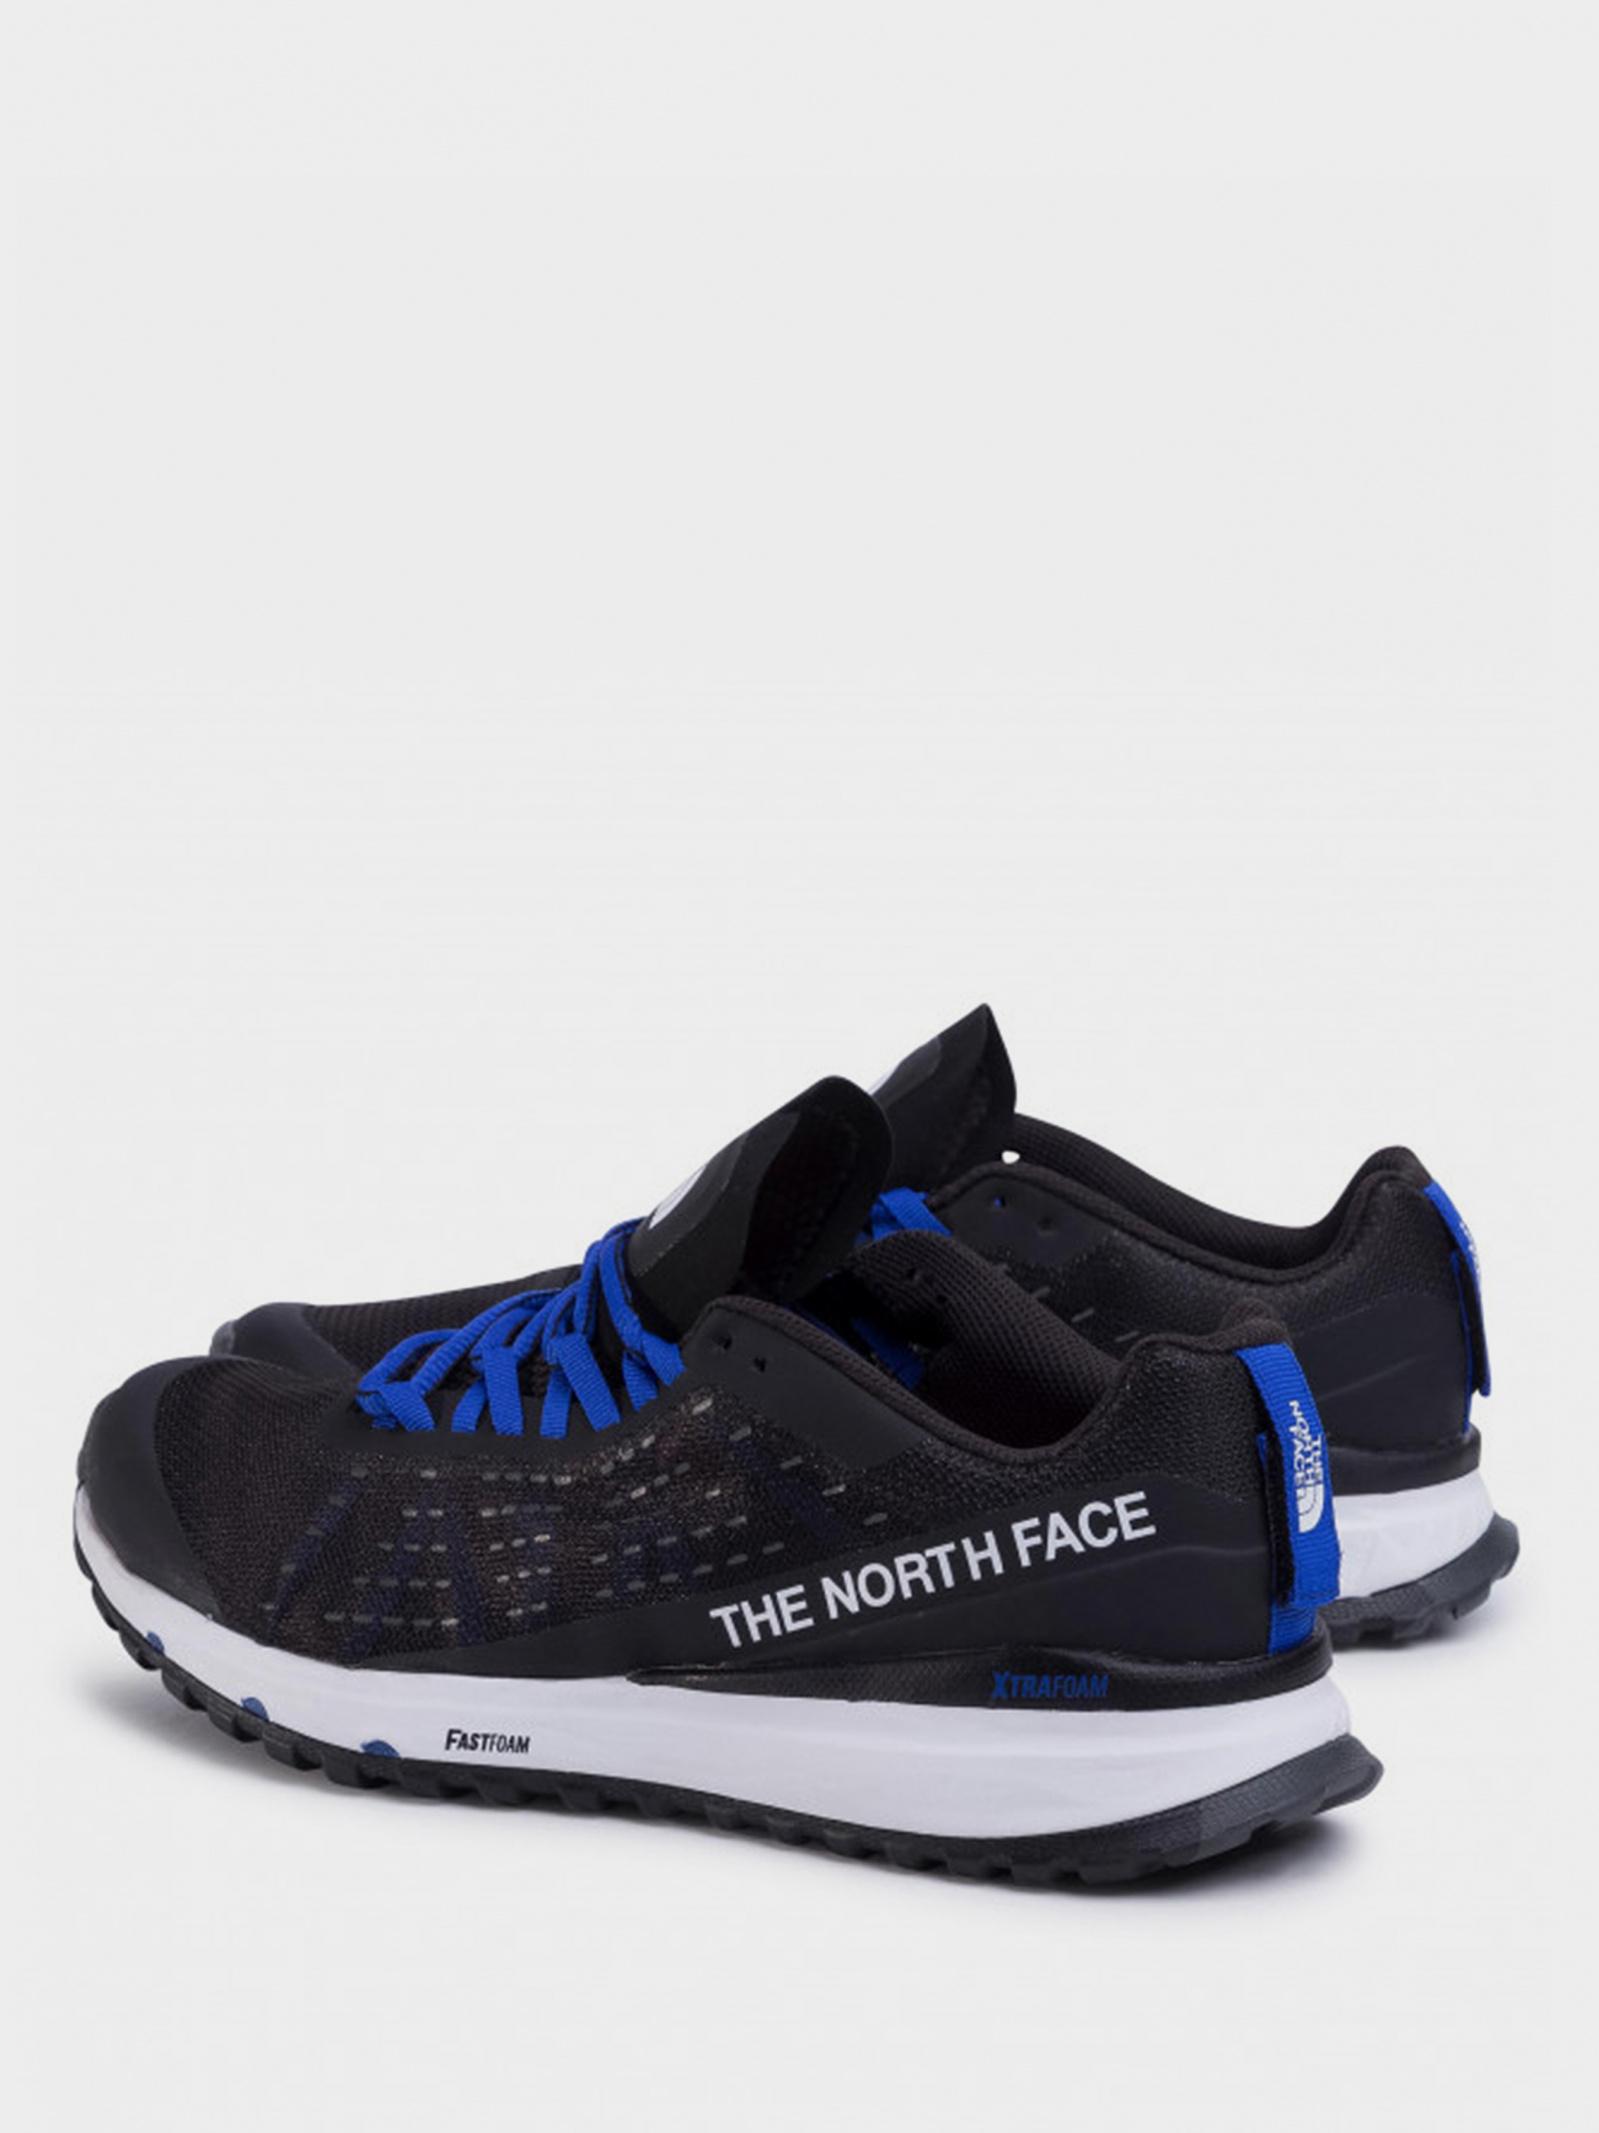 Кросівки  чоловічі The North Face Men's Ultra Swift NF0A3X1FG371 ціна, 2017